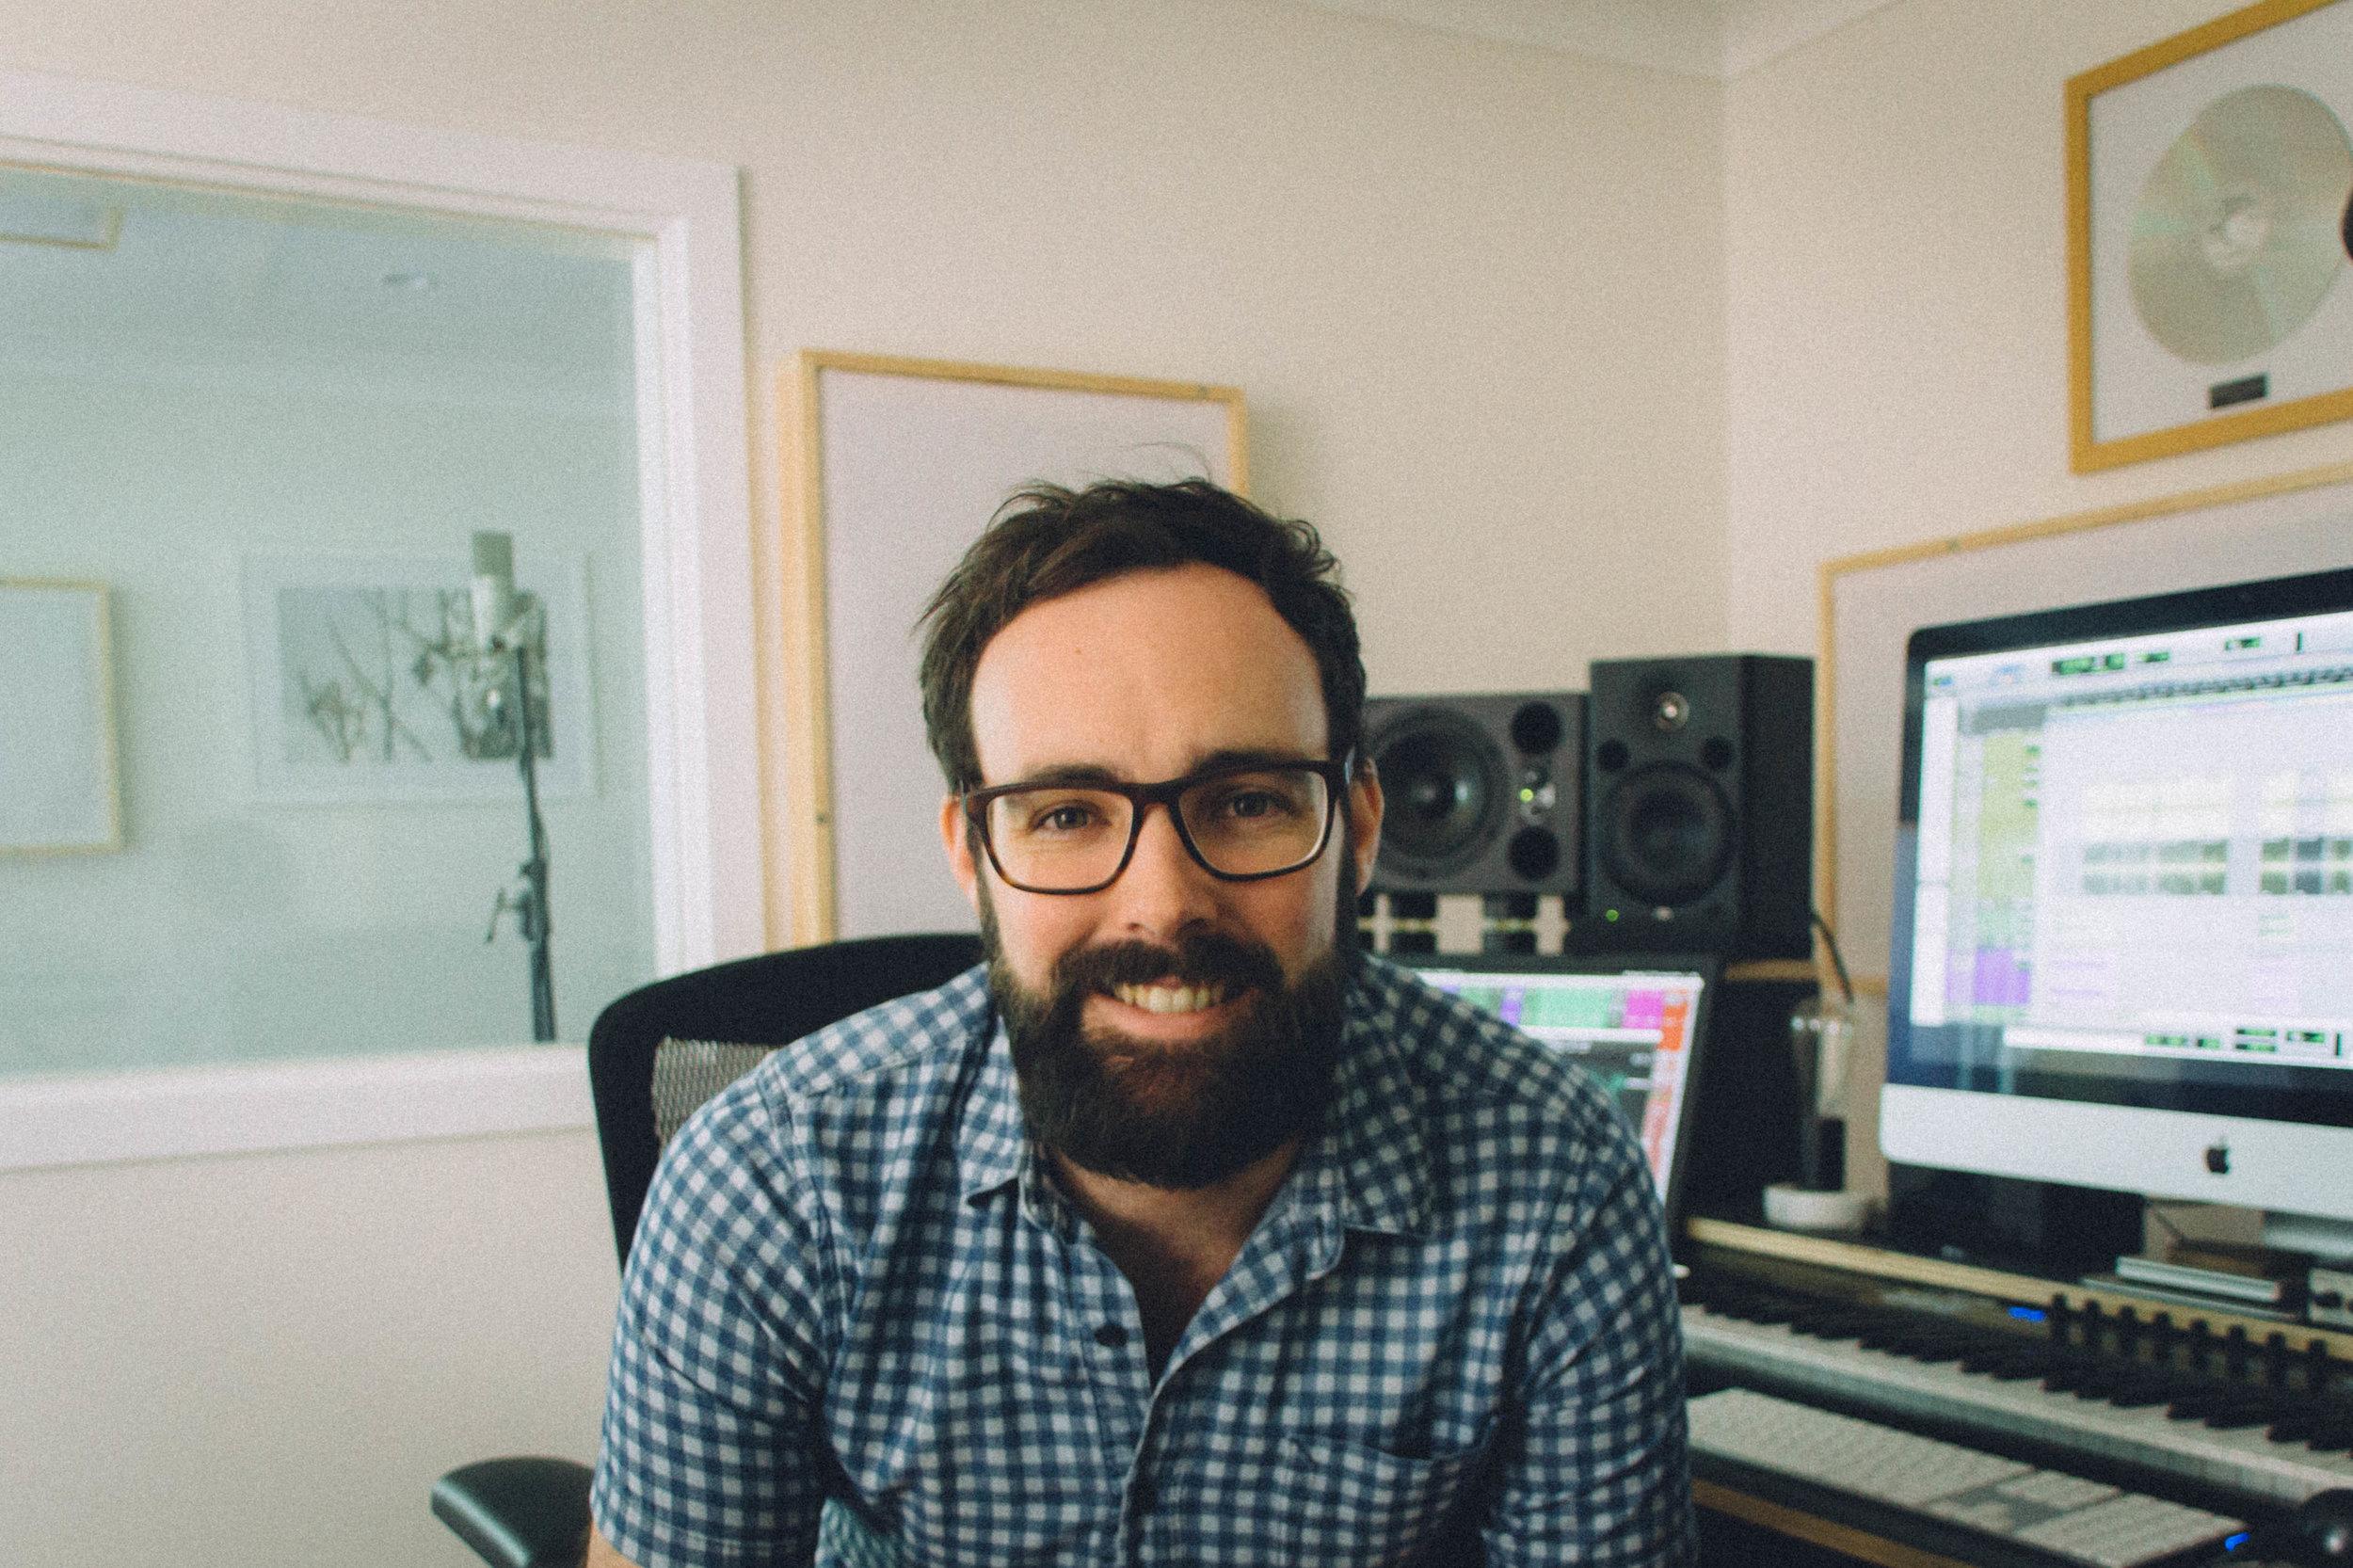 Jake Graham, music tutor at Heavy Feet Studios in Wallsend, Newcastle